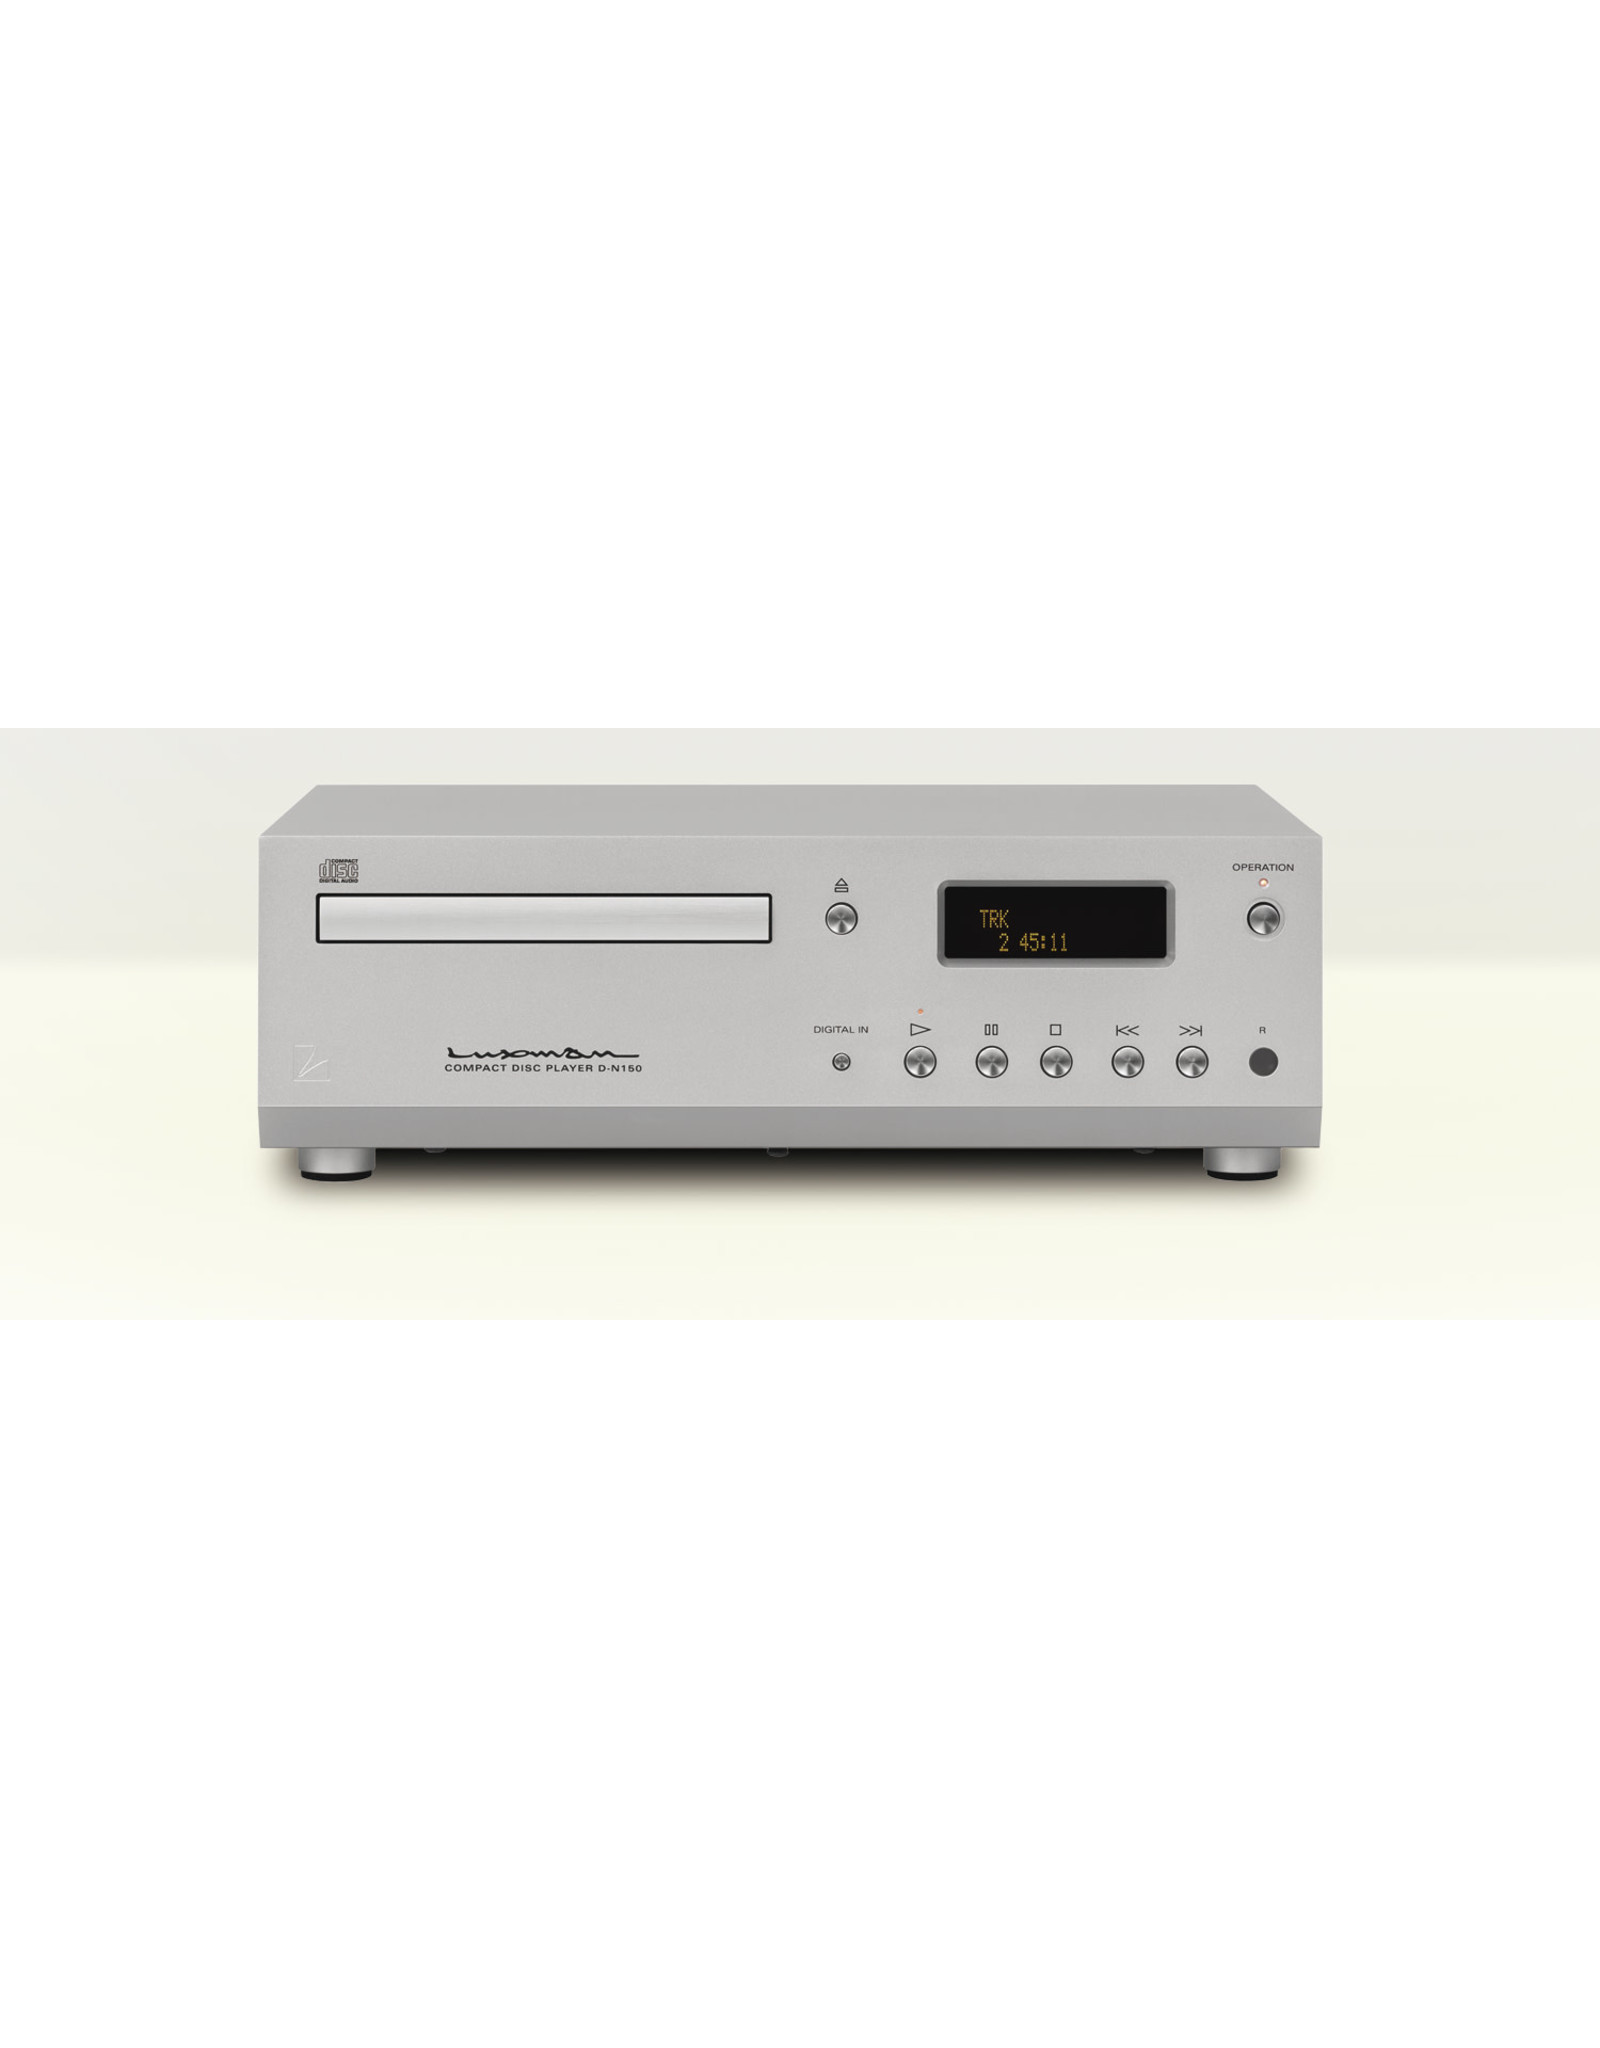 Luxman Luxman D-N150 DAC / CD player